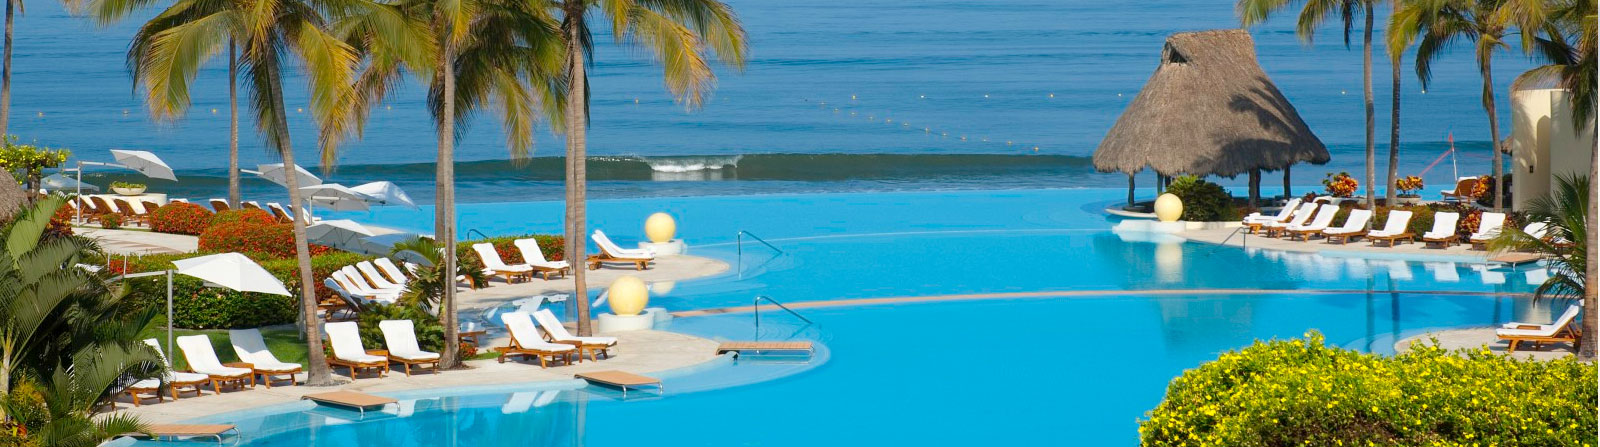 Destinos no Grand Velas Riviera Nayarit México